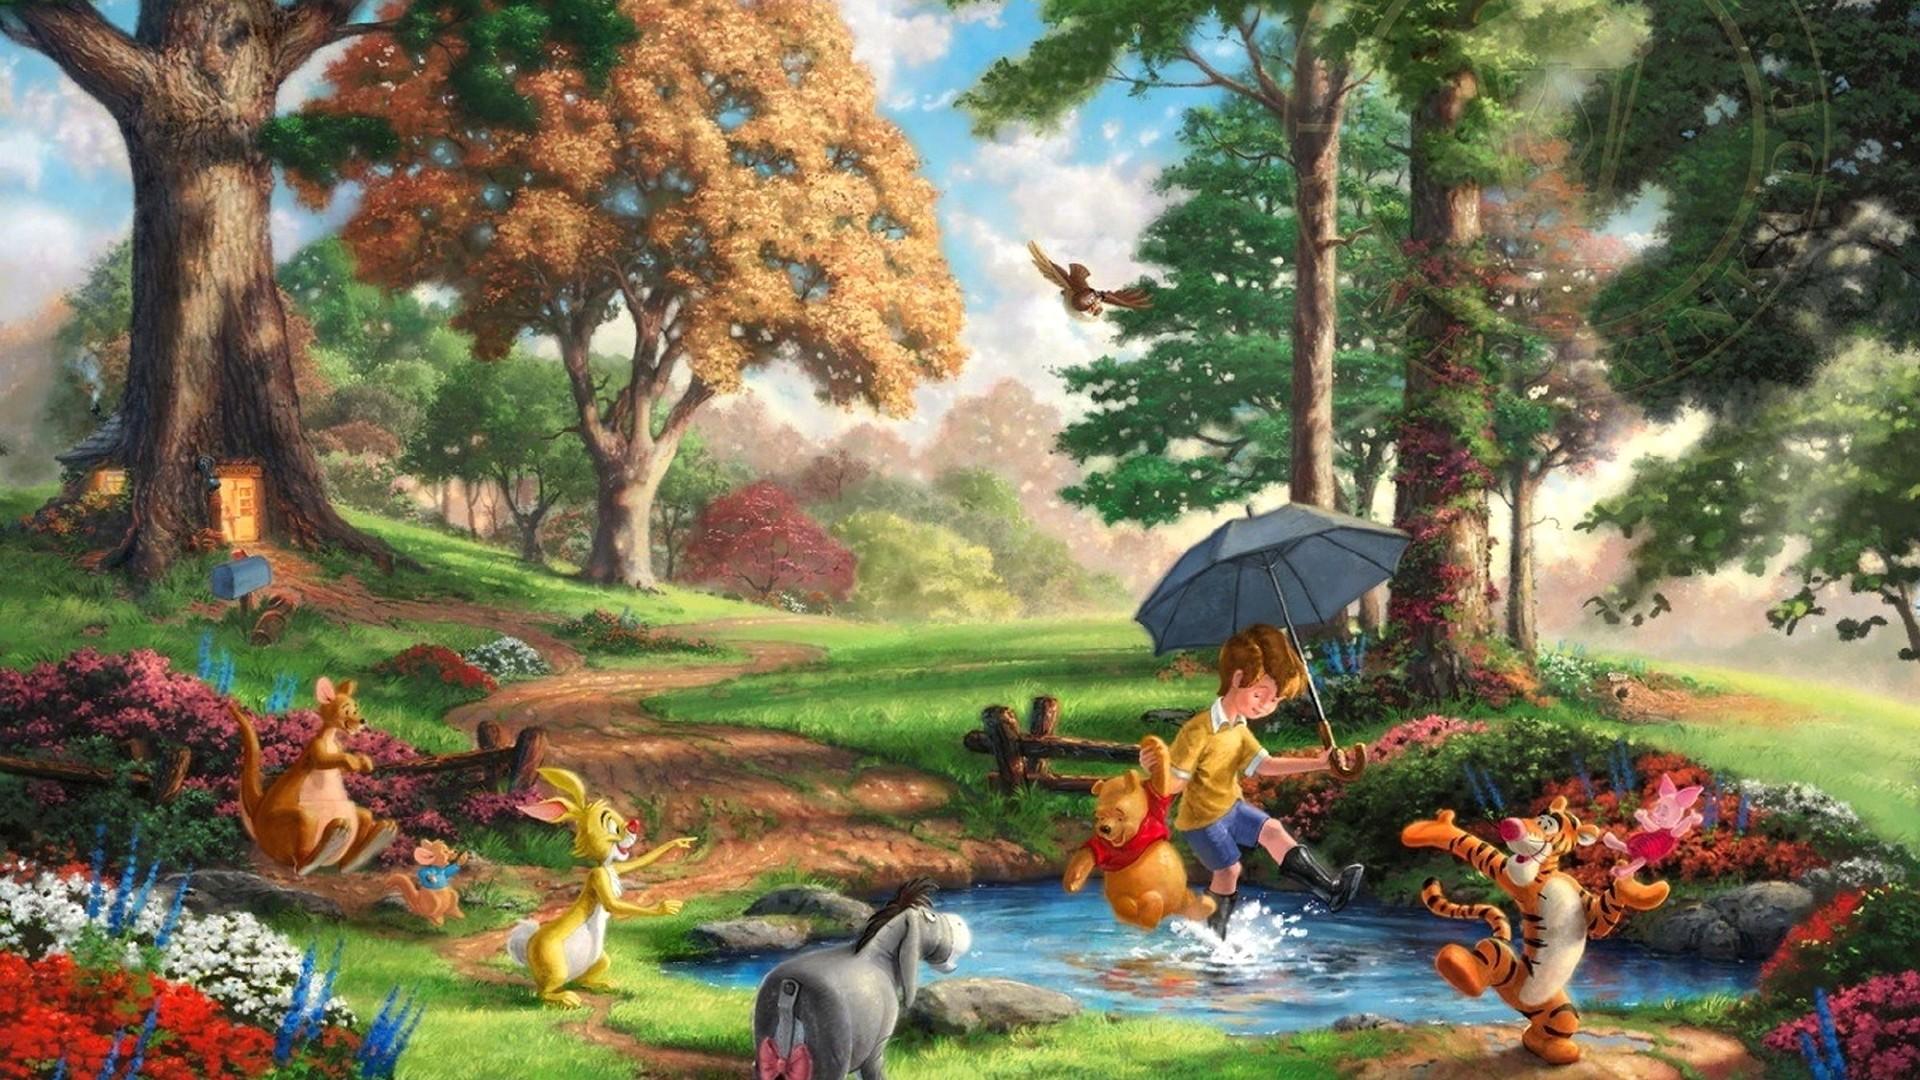 Thomas Kinkade Disney Wallpaper 1920x1080 - WallpaperSafari